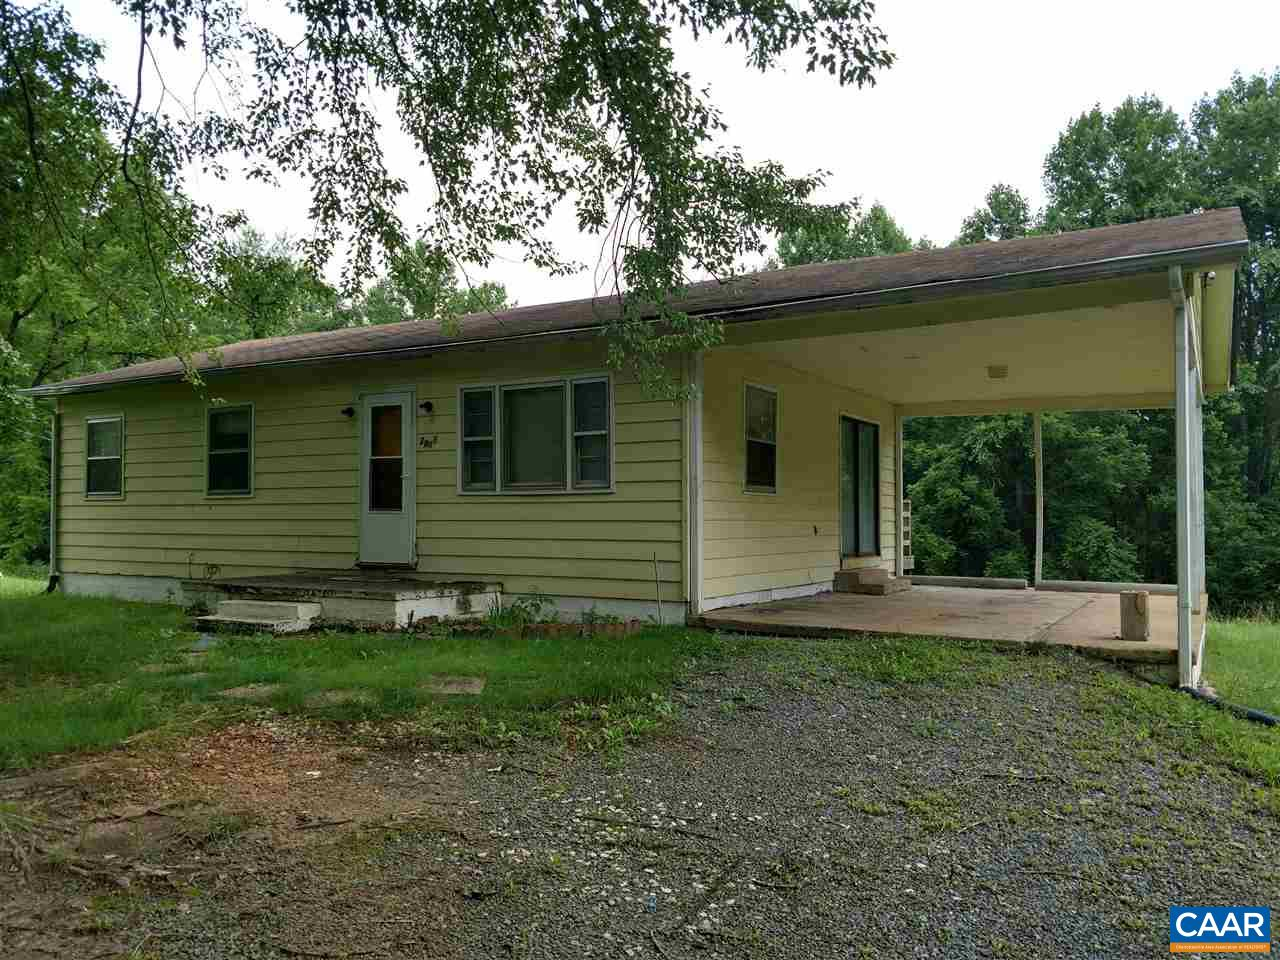 2801 JACKS SHOP RD, MADISON, VA 22727